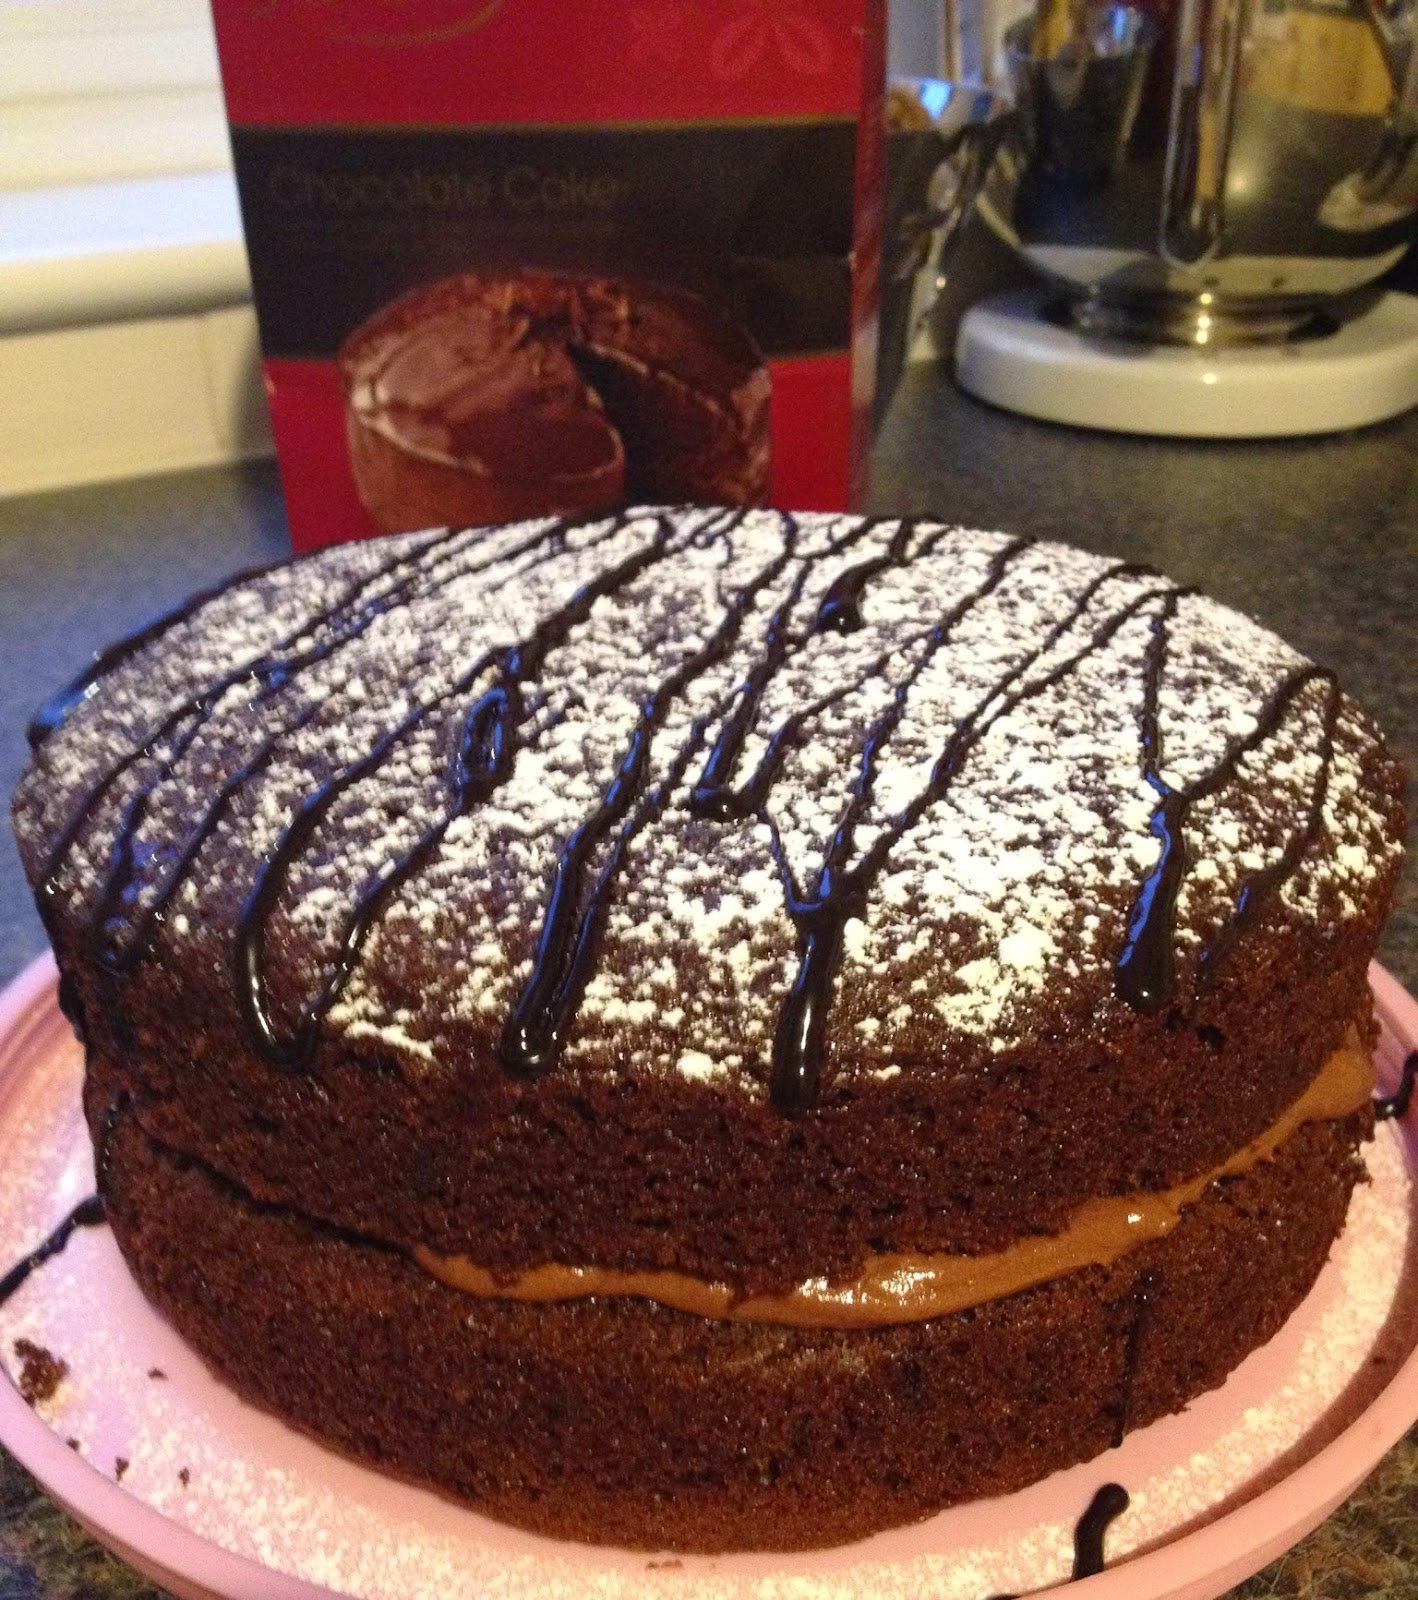 Chocolate Cake for Macmillan